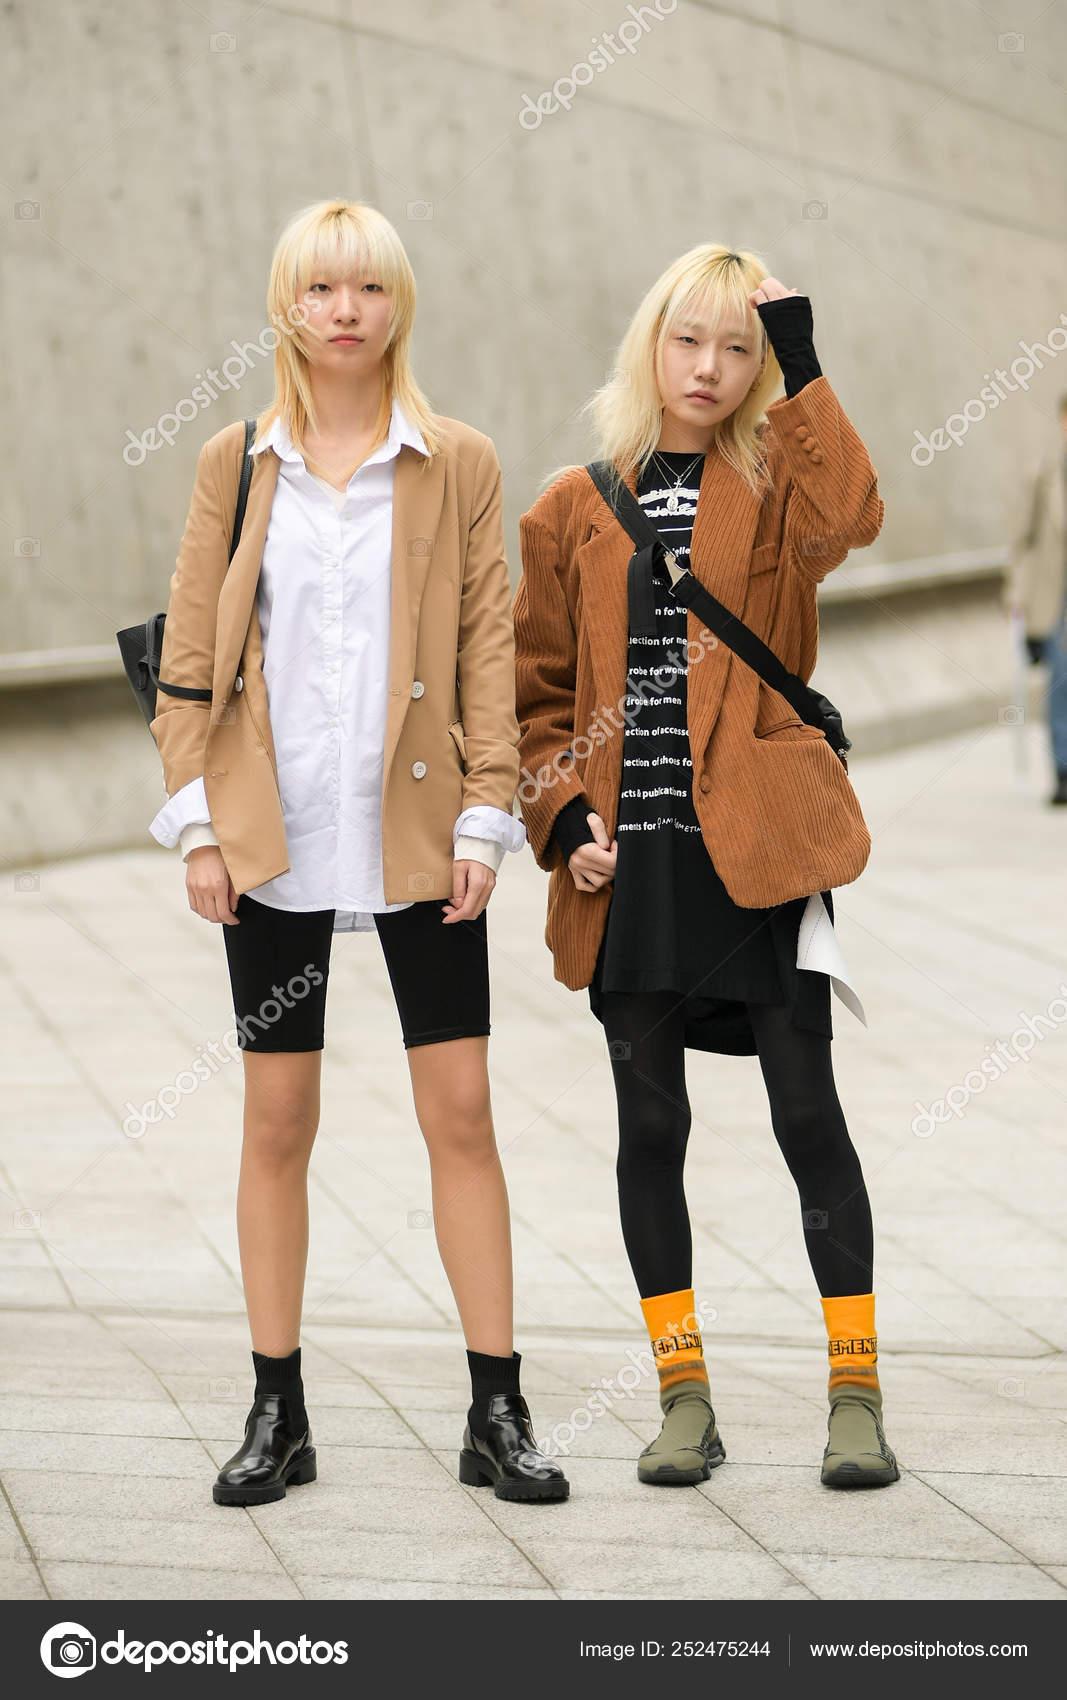 Korean Female Winter Fashion South Korea 2019 Fall Winter Seoul Fashion Week Stock Editorial Photo C Imaginechina Editorial 252475244